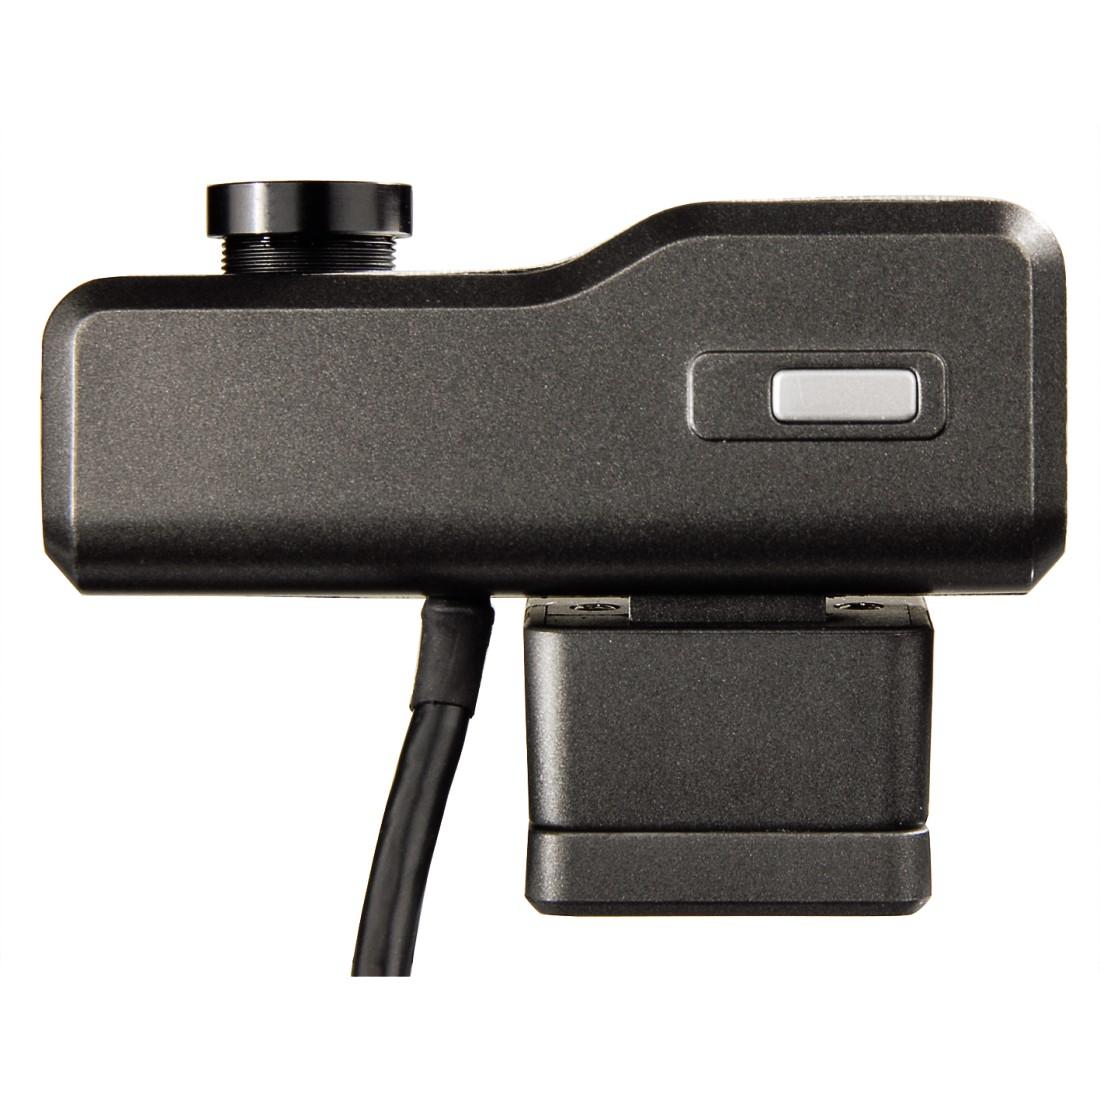 HAMA Messenger Set II PC Webcam/Headset Download Drivers